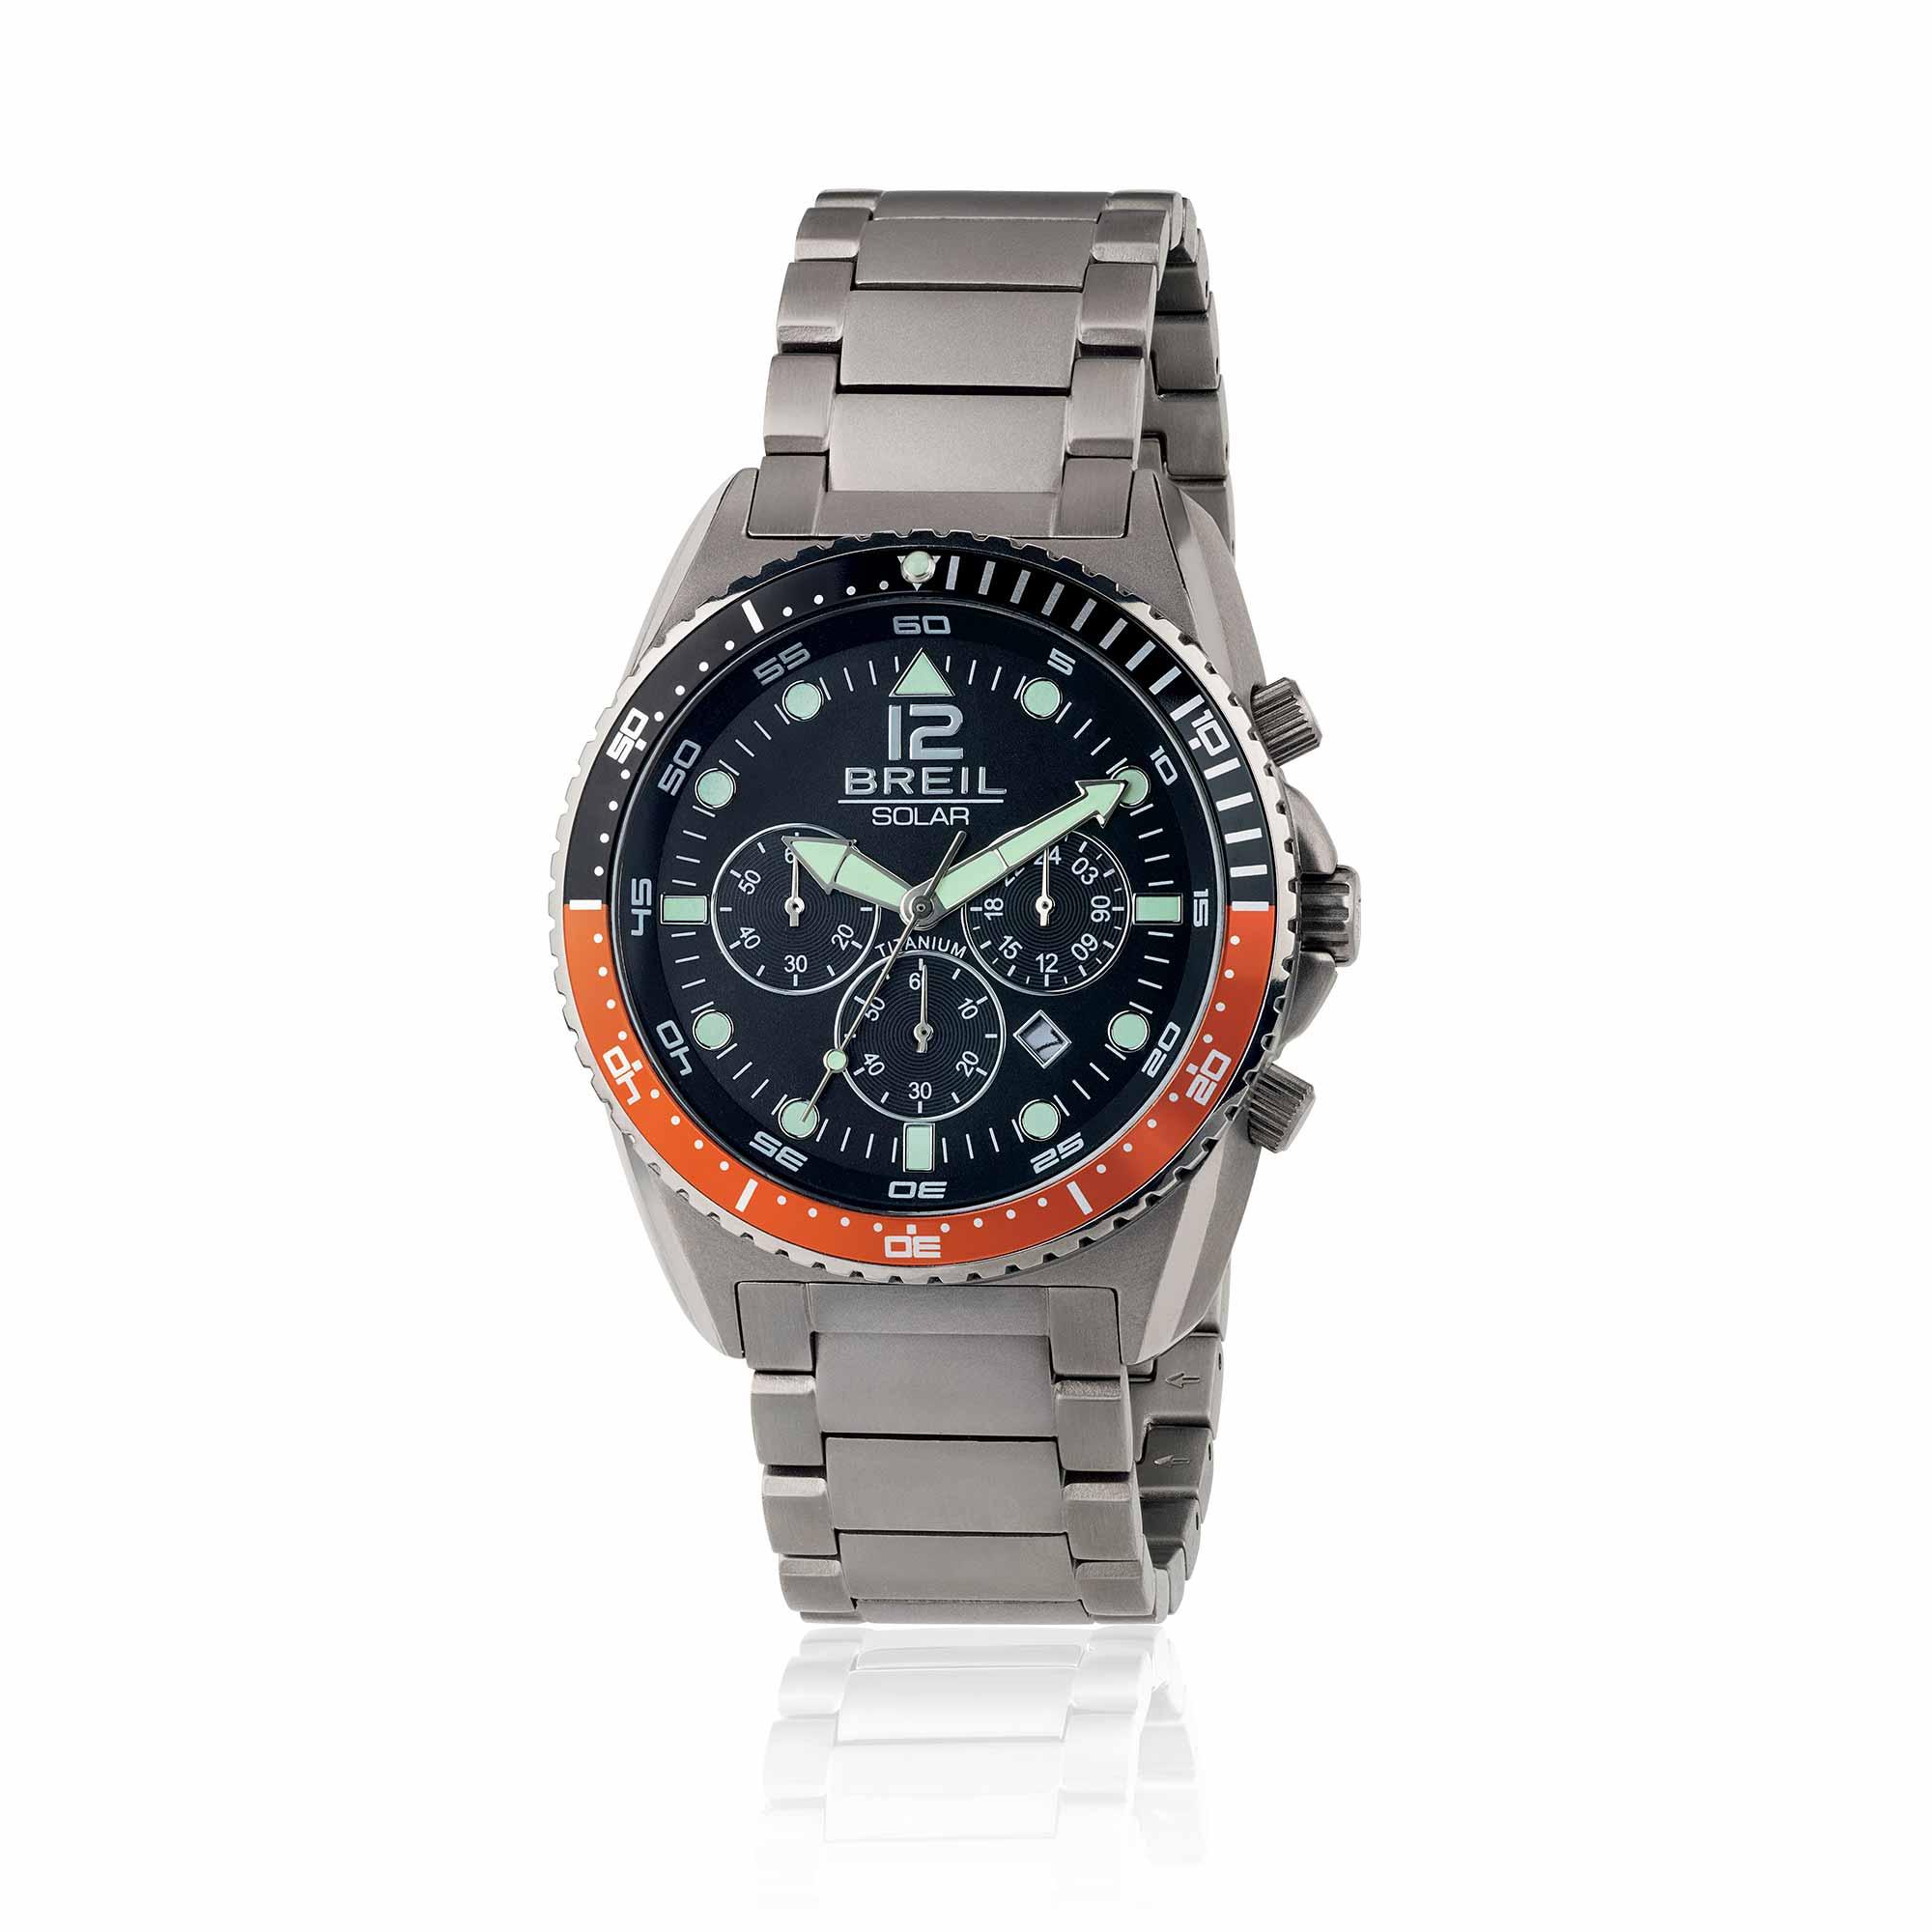 3799ae15740a87 breil uomo, orologio uomo ,orologio titanio, Breil carica solare, breil  torino,